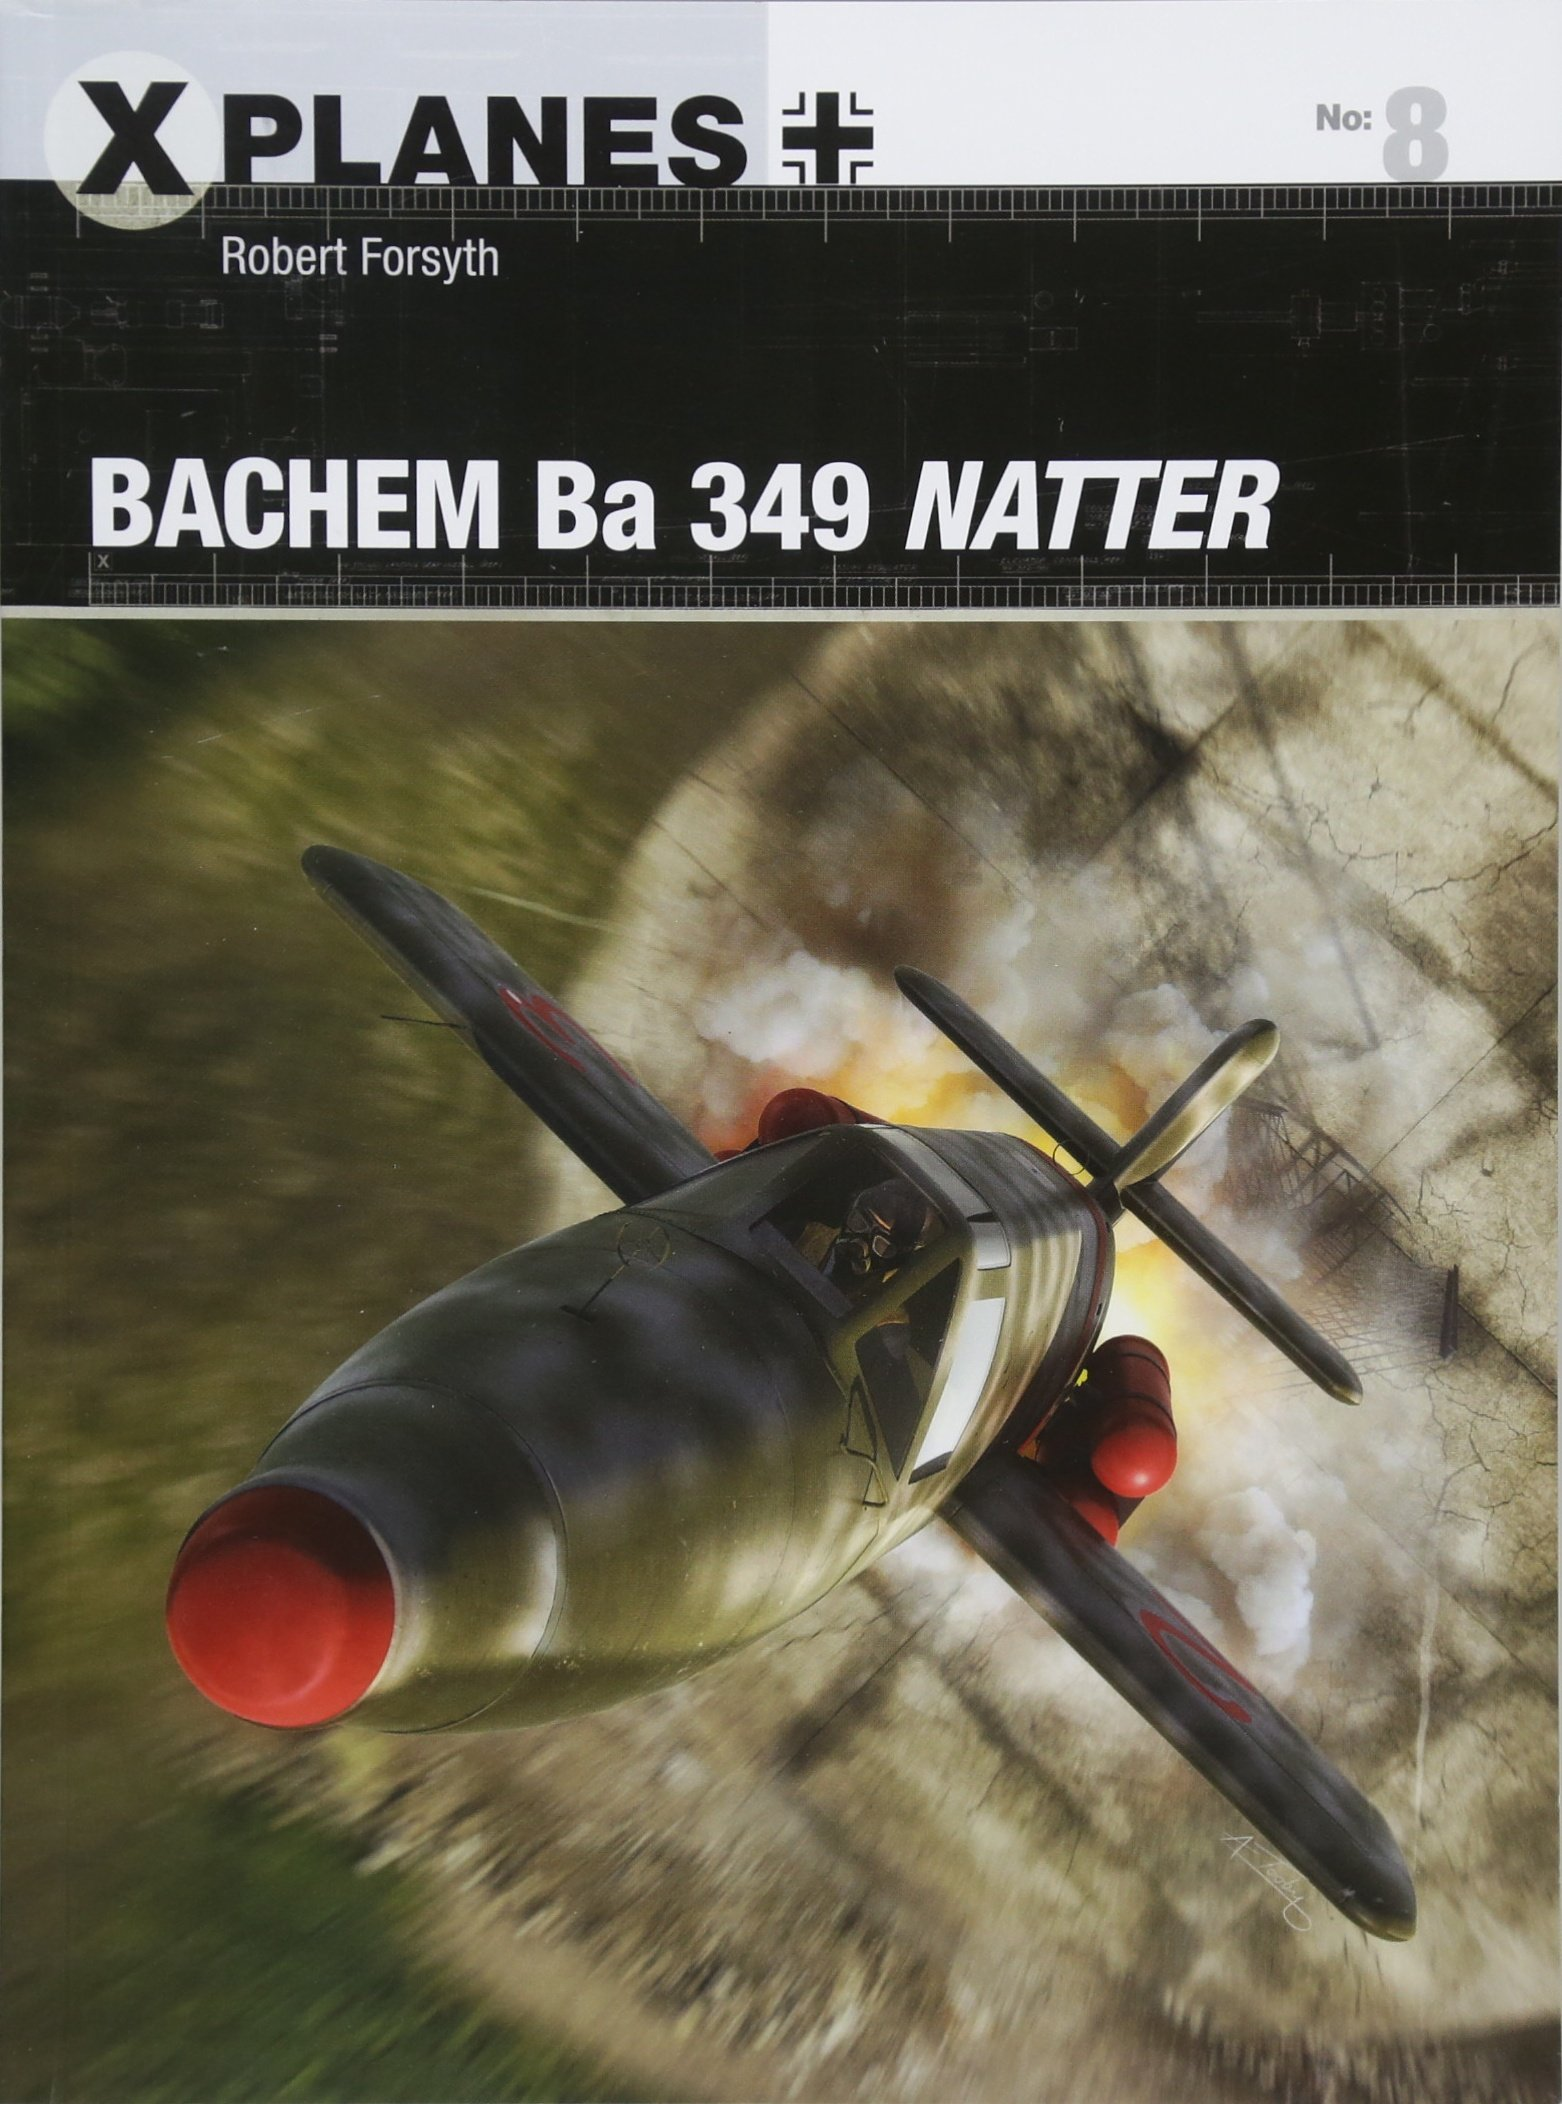 Bachem Ba 349 Natter (X-Planes, Band 8)